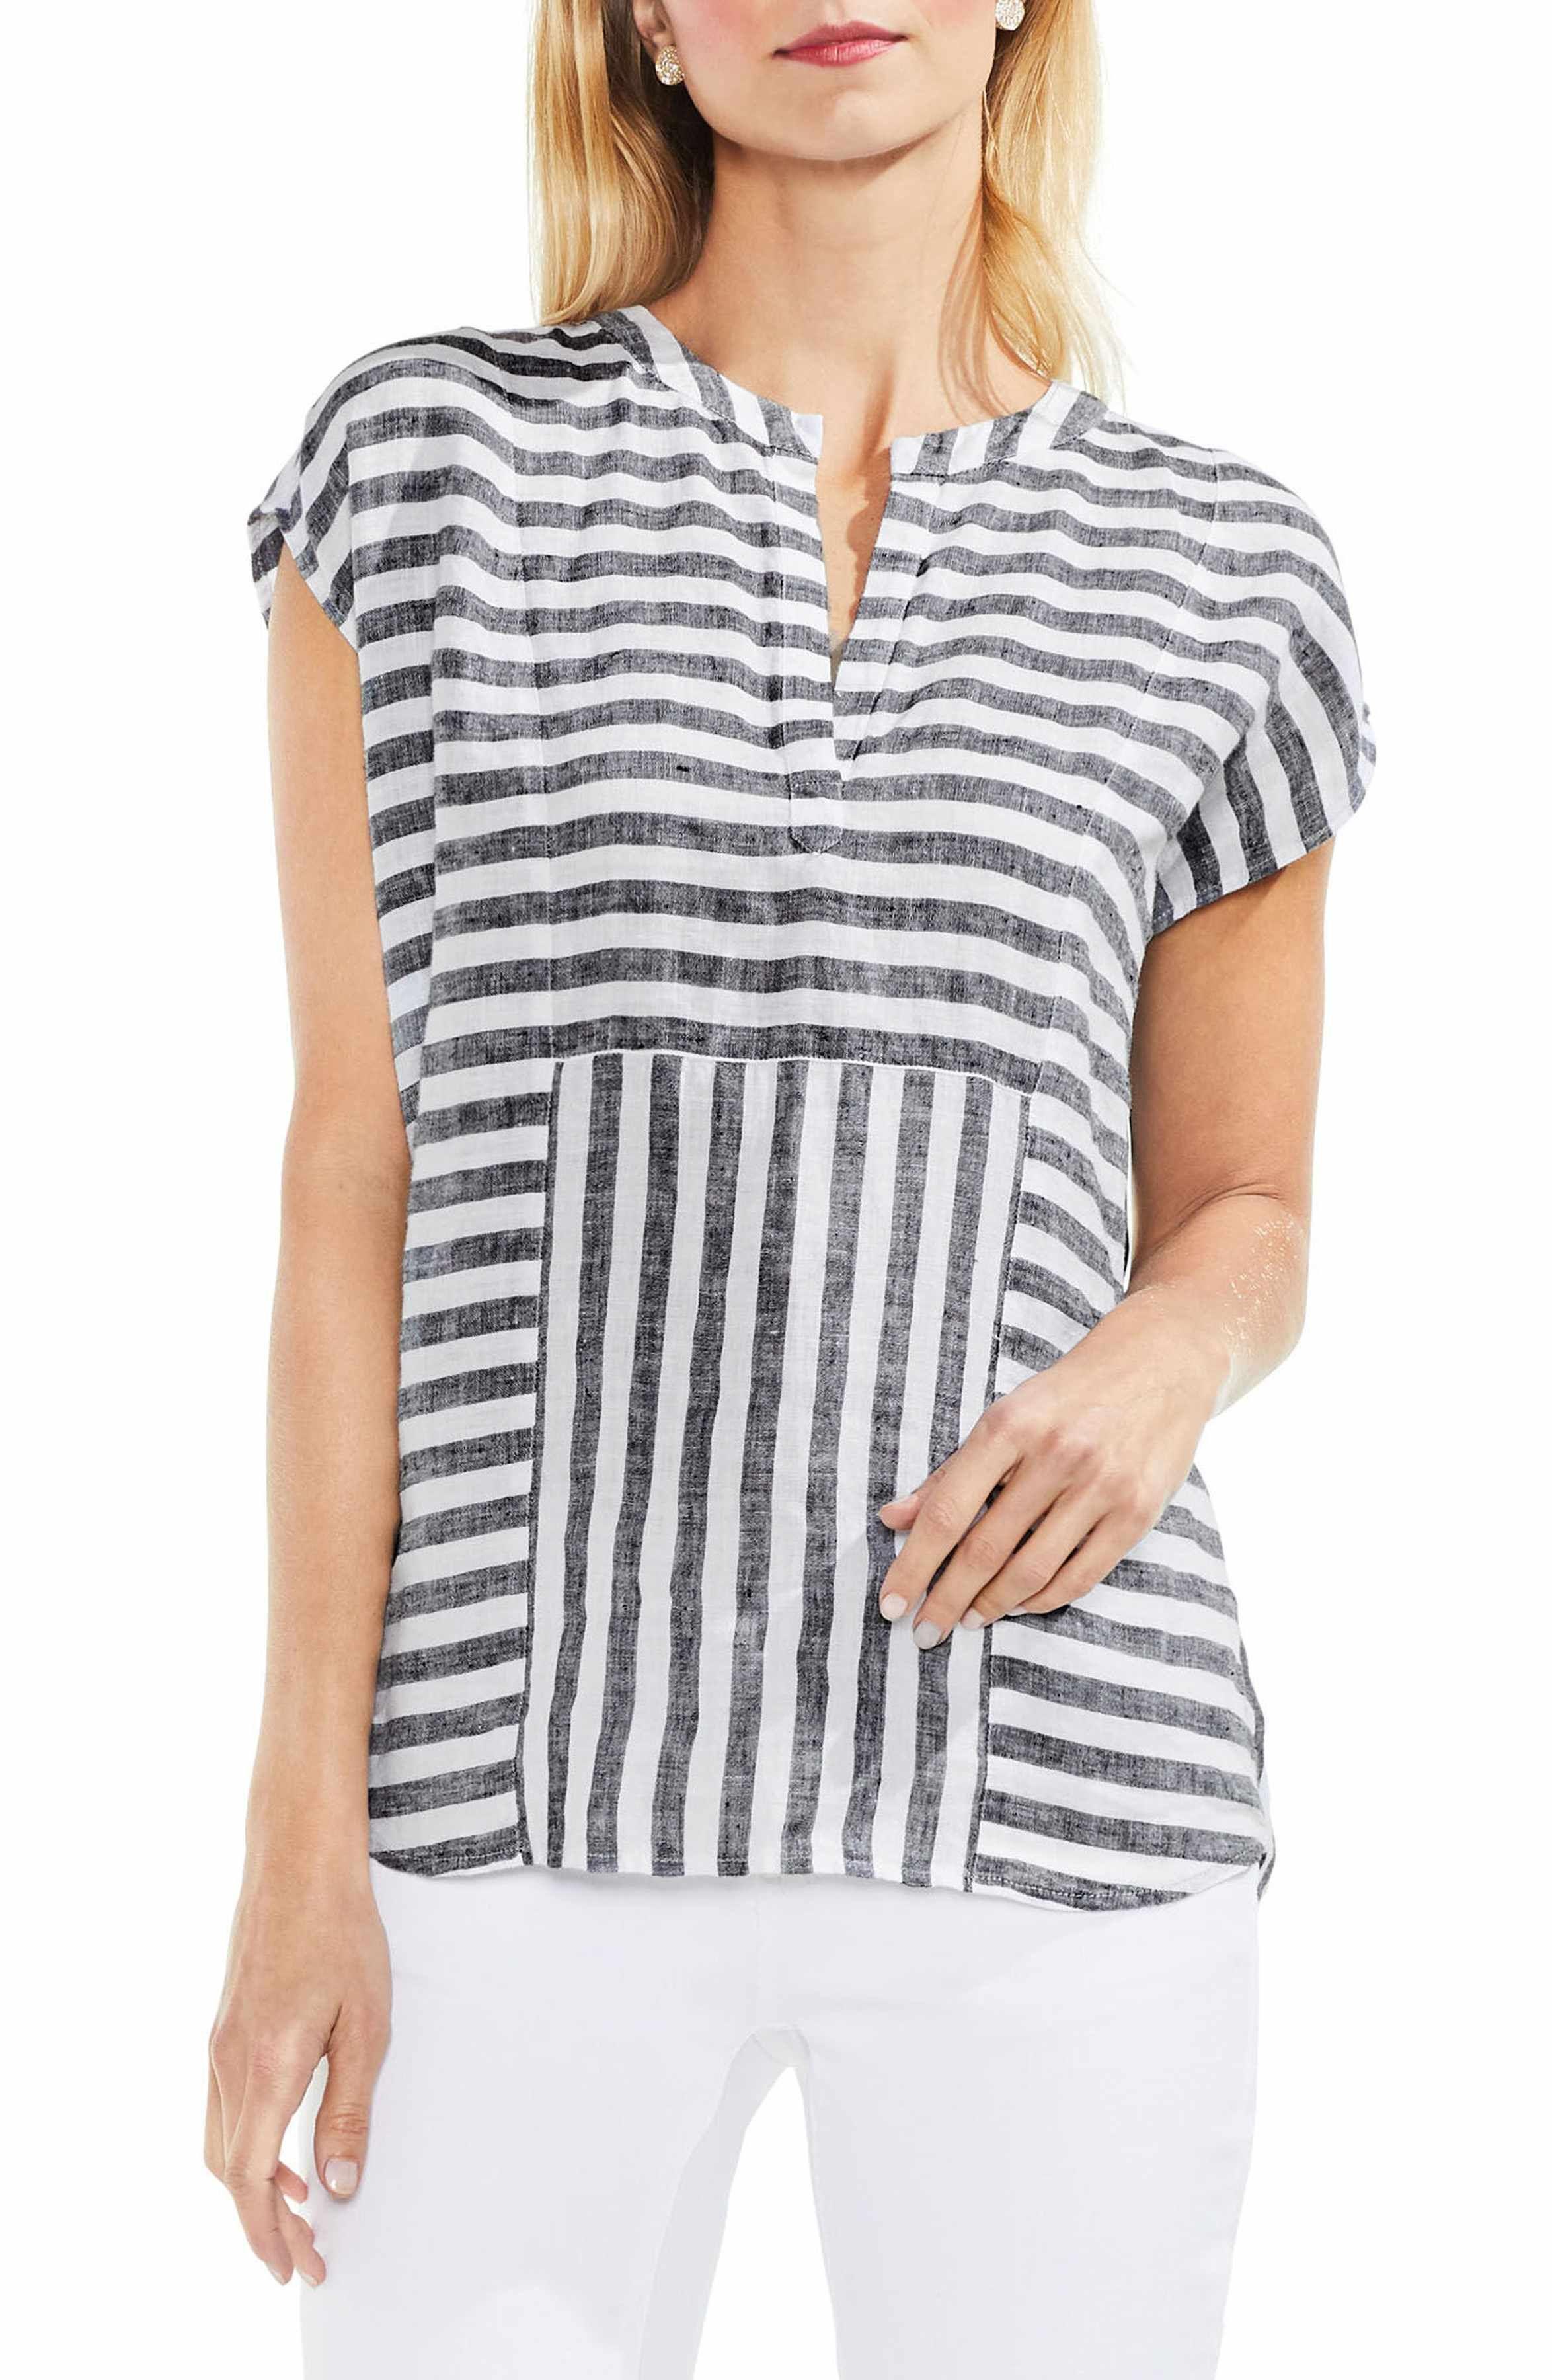 ab82ac7d06 Main Image - Vince Camuto Resort Stripe Linen Blouse